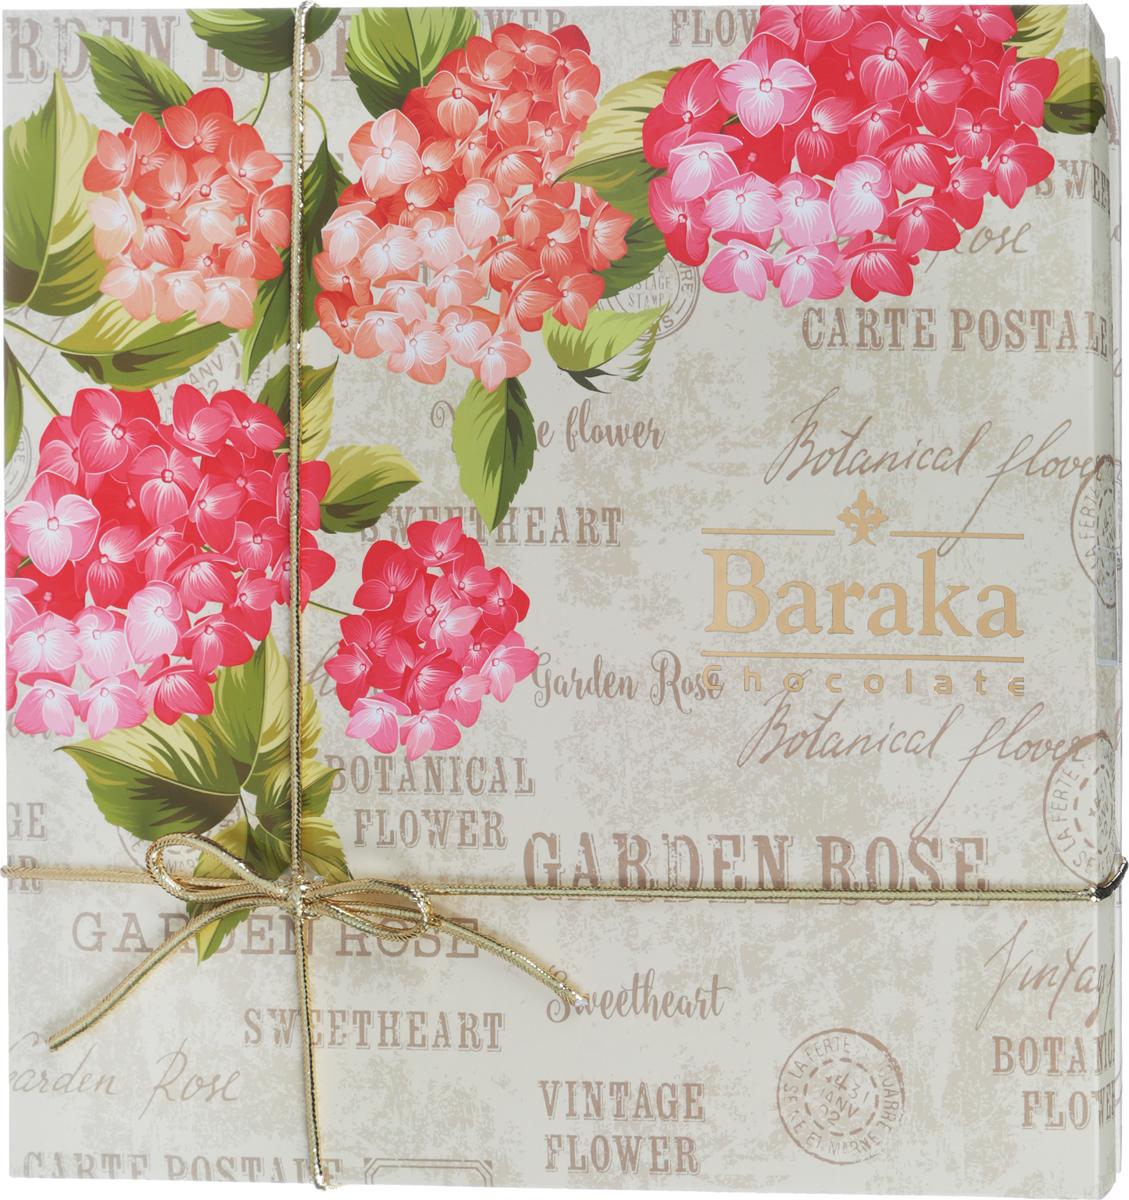 Baraka Нилу ассорти шоколадных конфет, 180 г